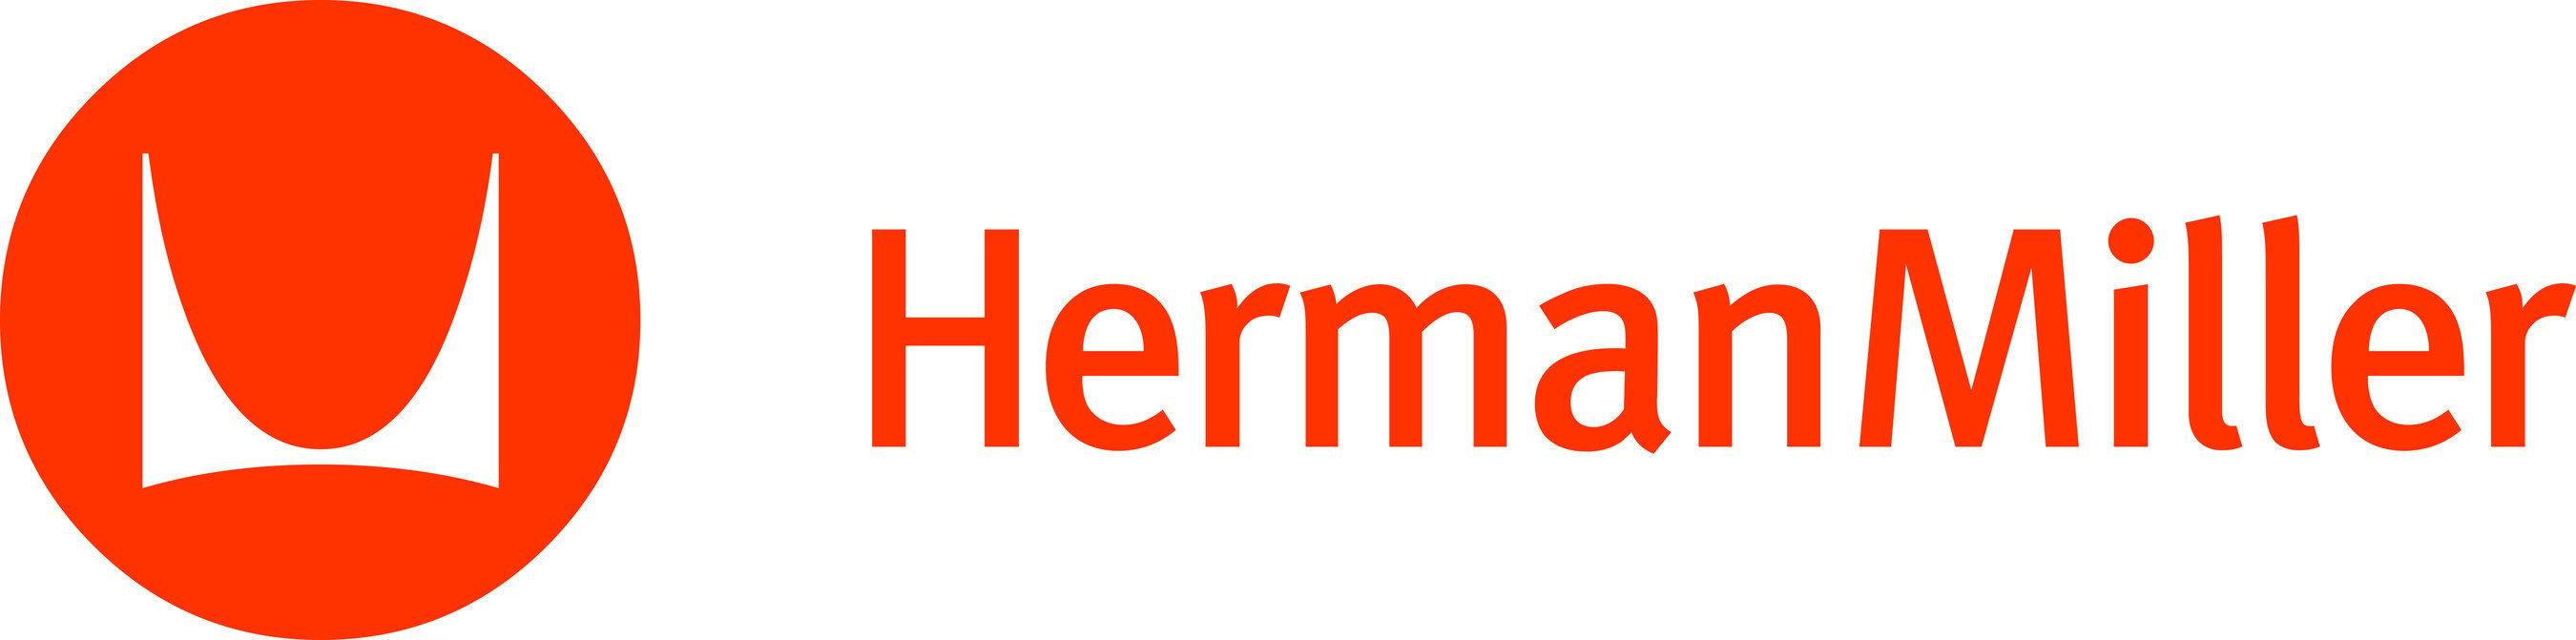 herman_millar